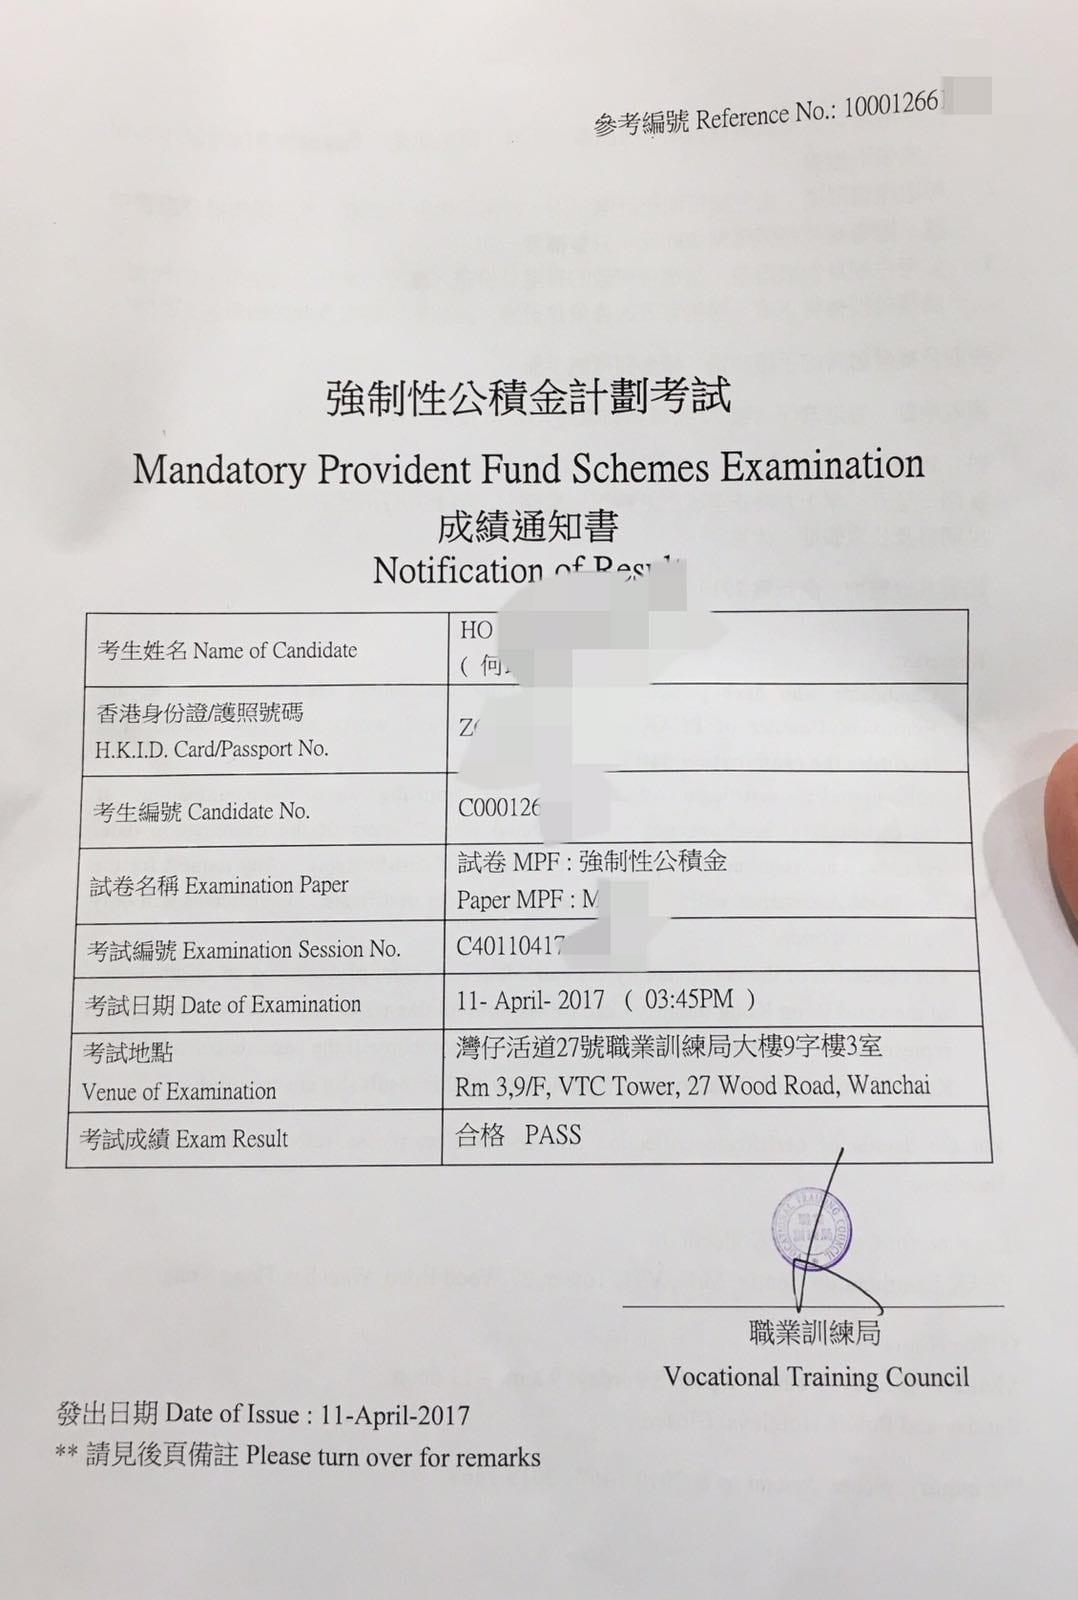 HCW 11/4/2017 MPFE 強積金中介人資格考試 Pass